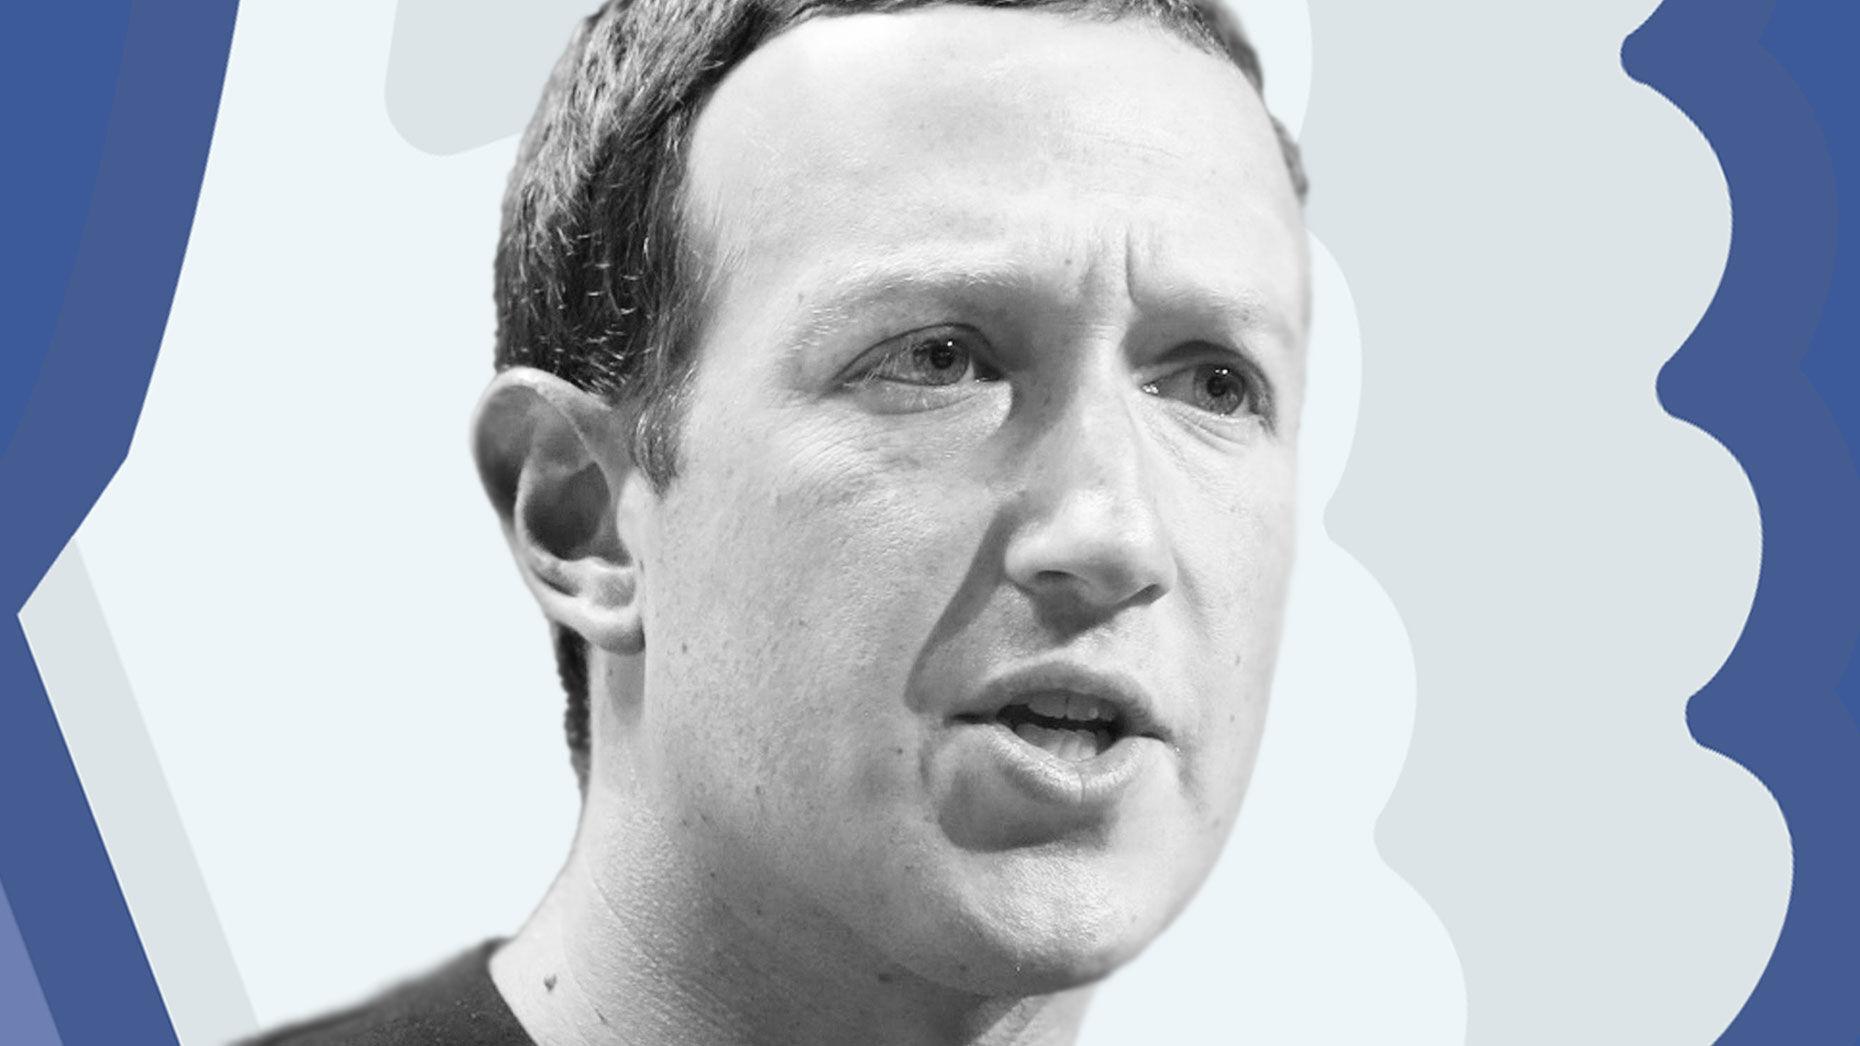 Facebook CEO Mark Zuckerberg. Photo by Bloomberg; art by Mike Sullivan.